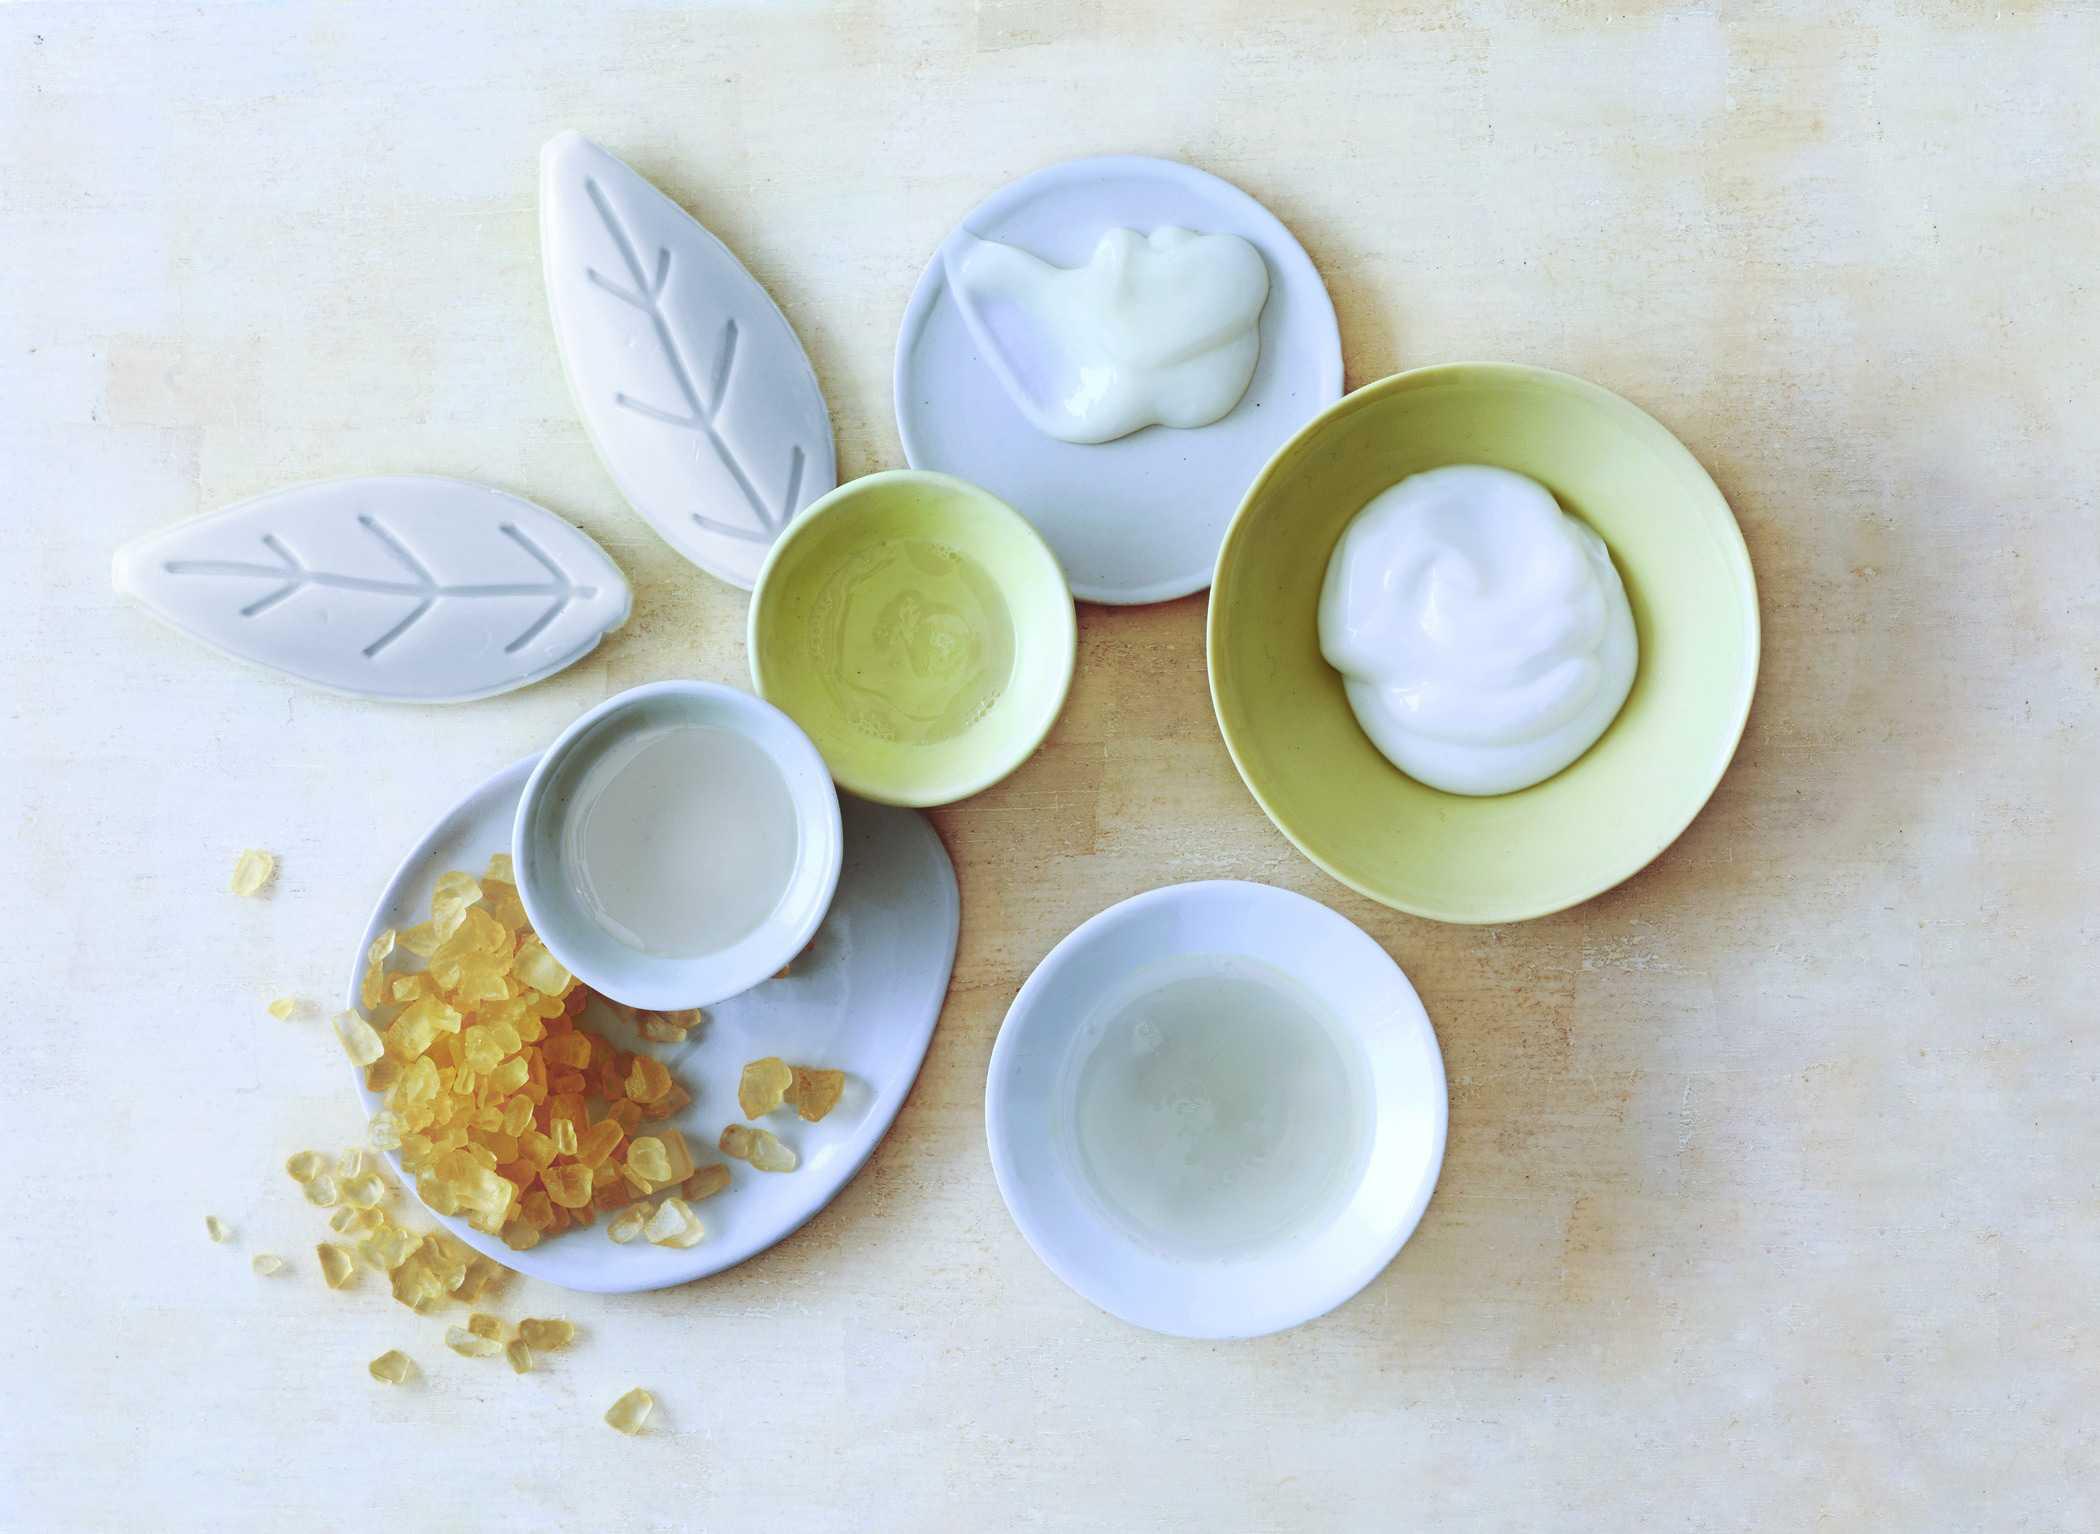 Heavenly-Spa-White-Tea-Aloe-Bath-Amenities